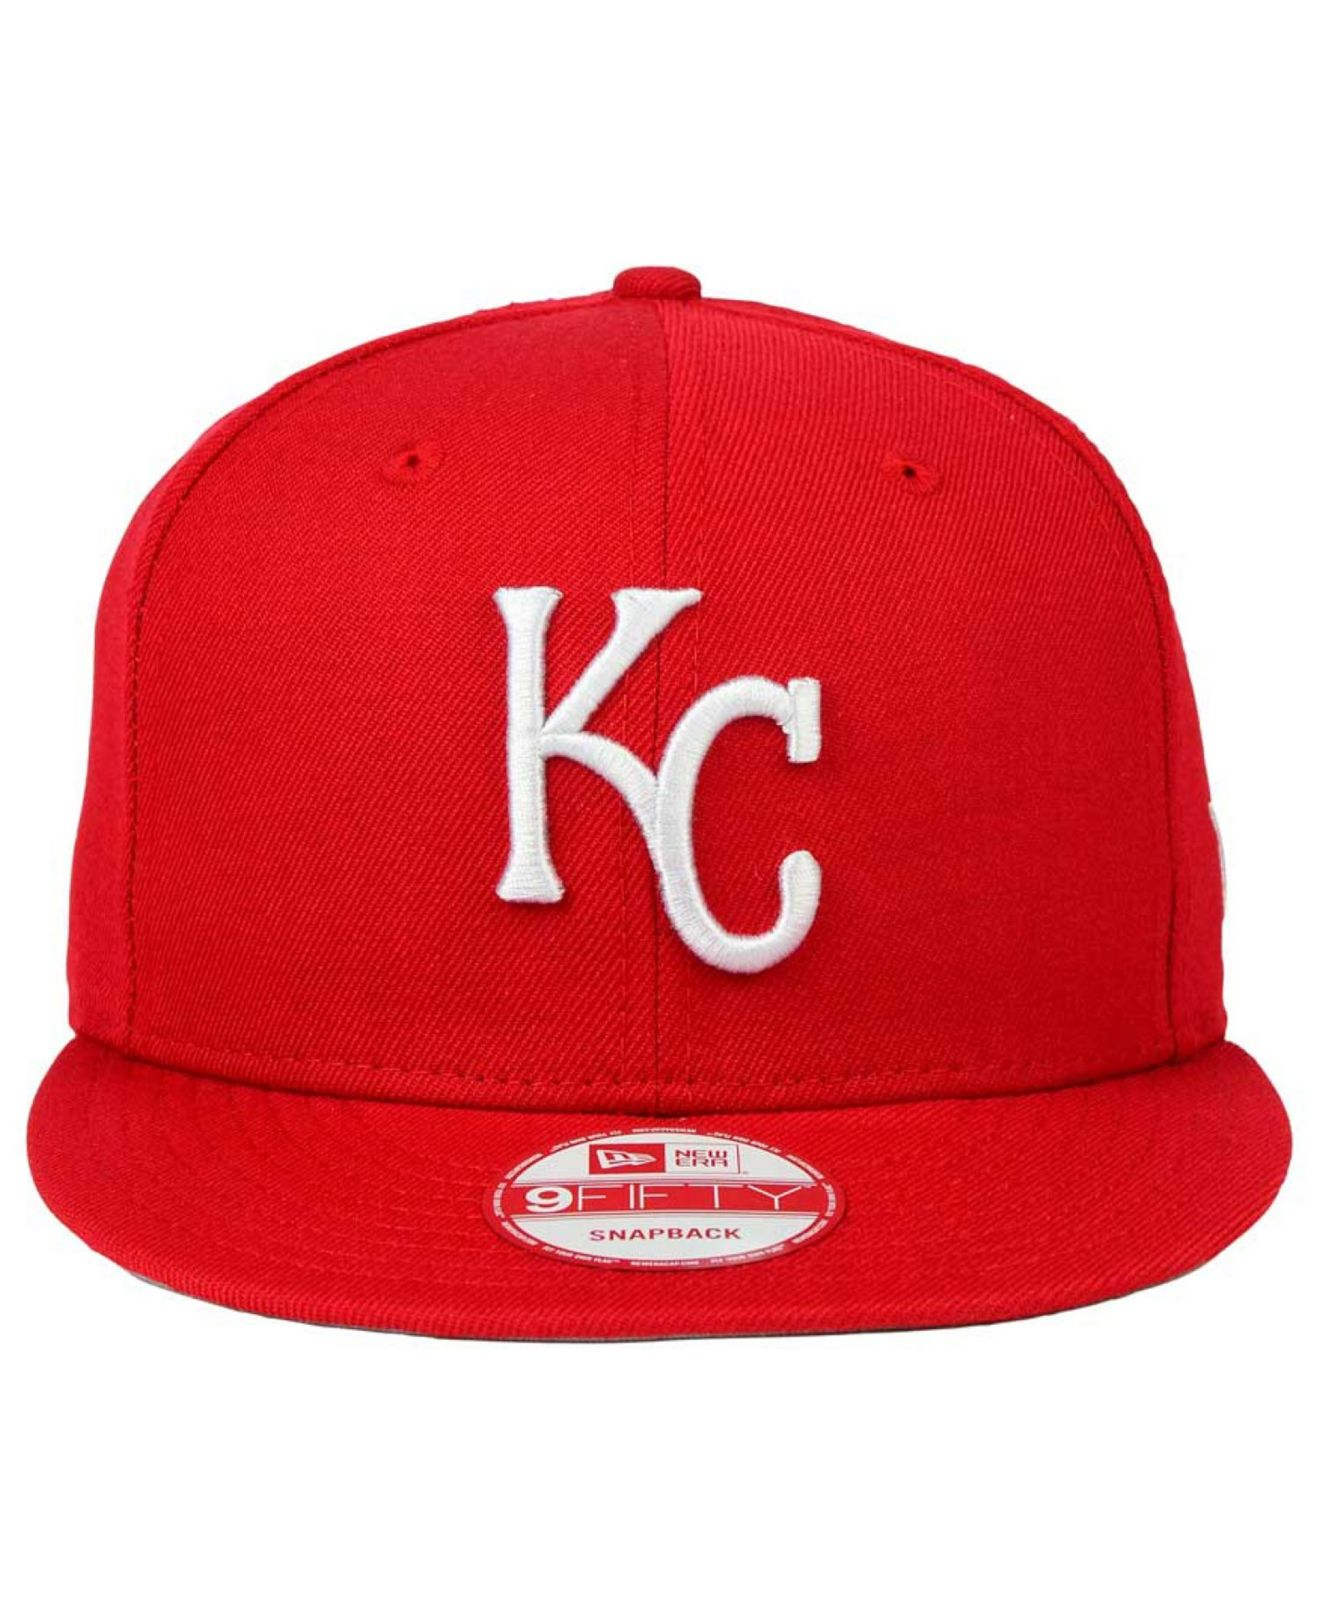 Kansas City Royals Snapback